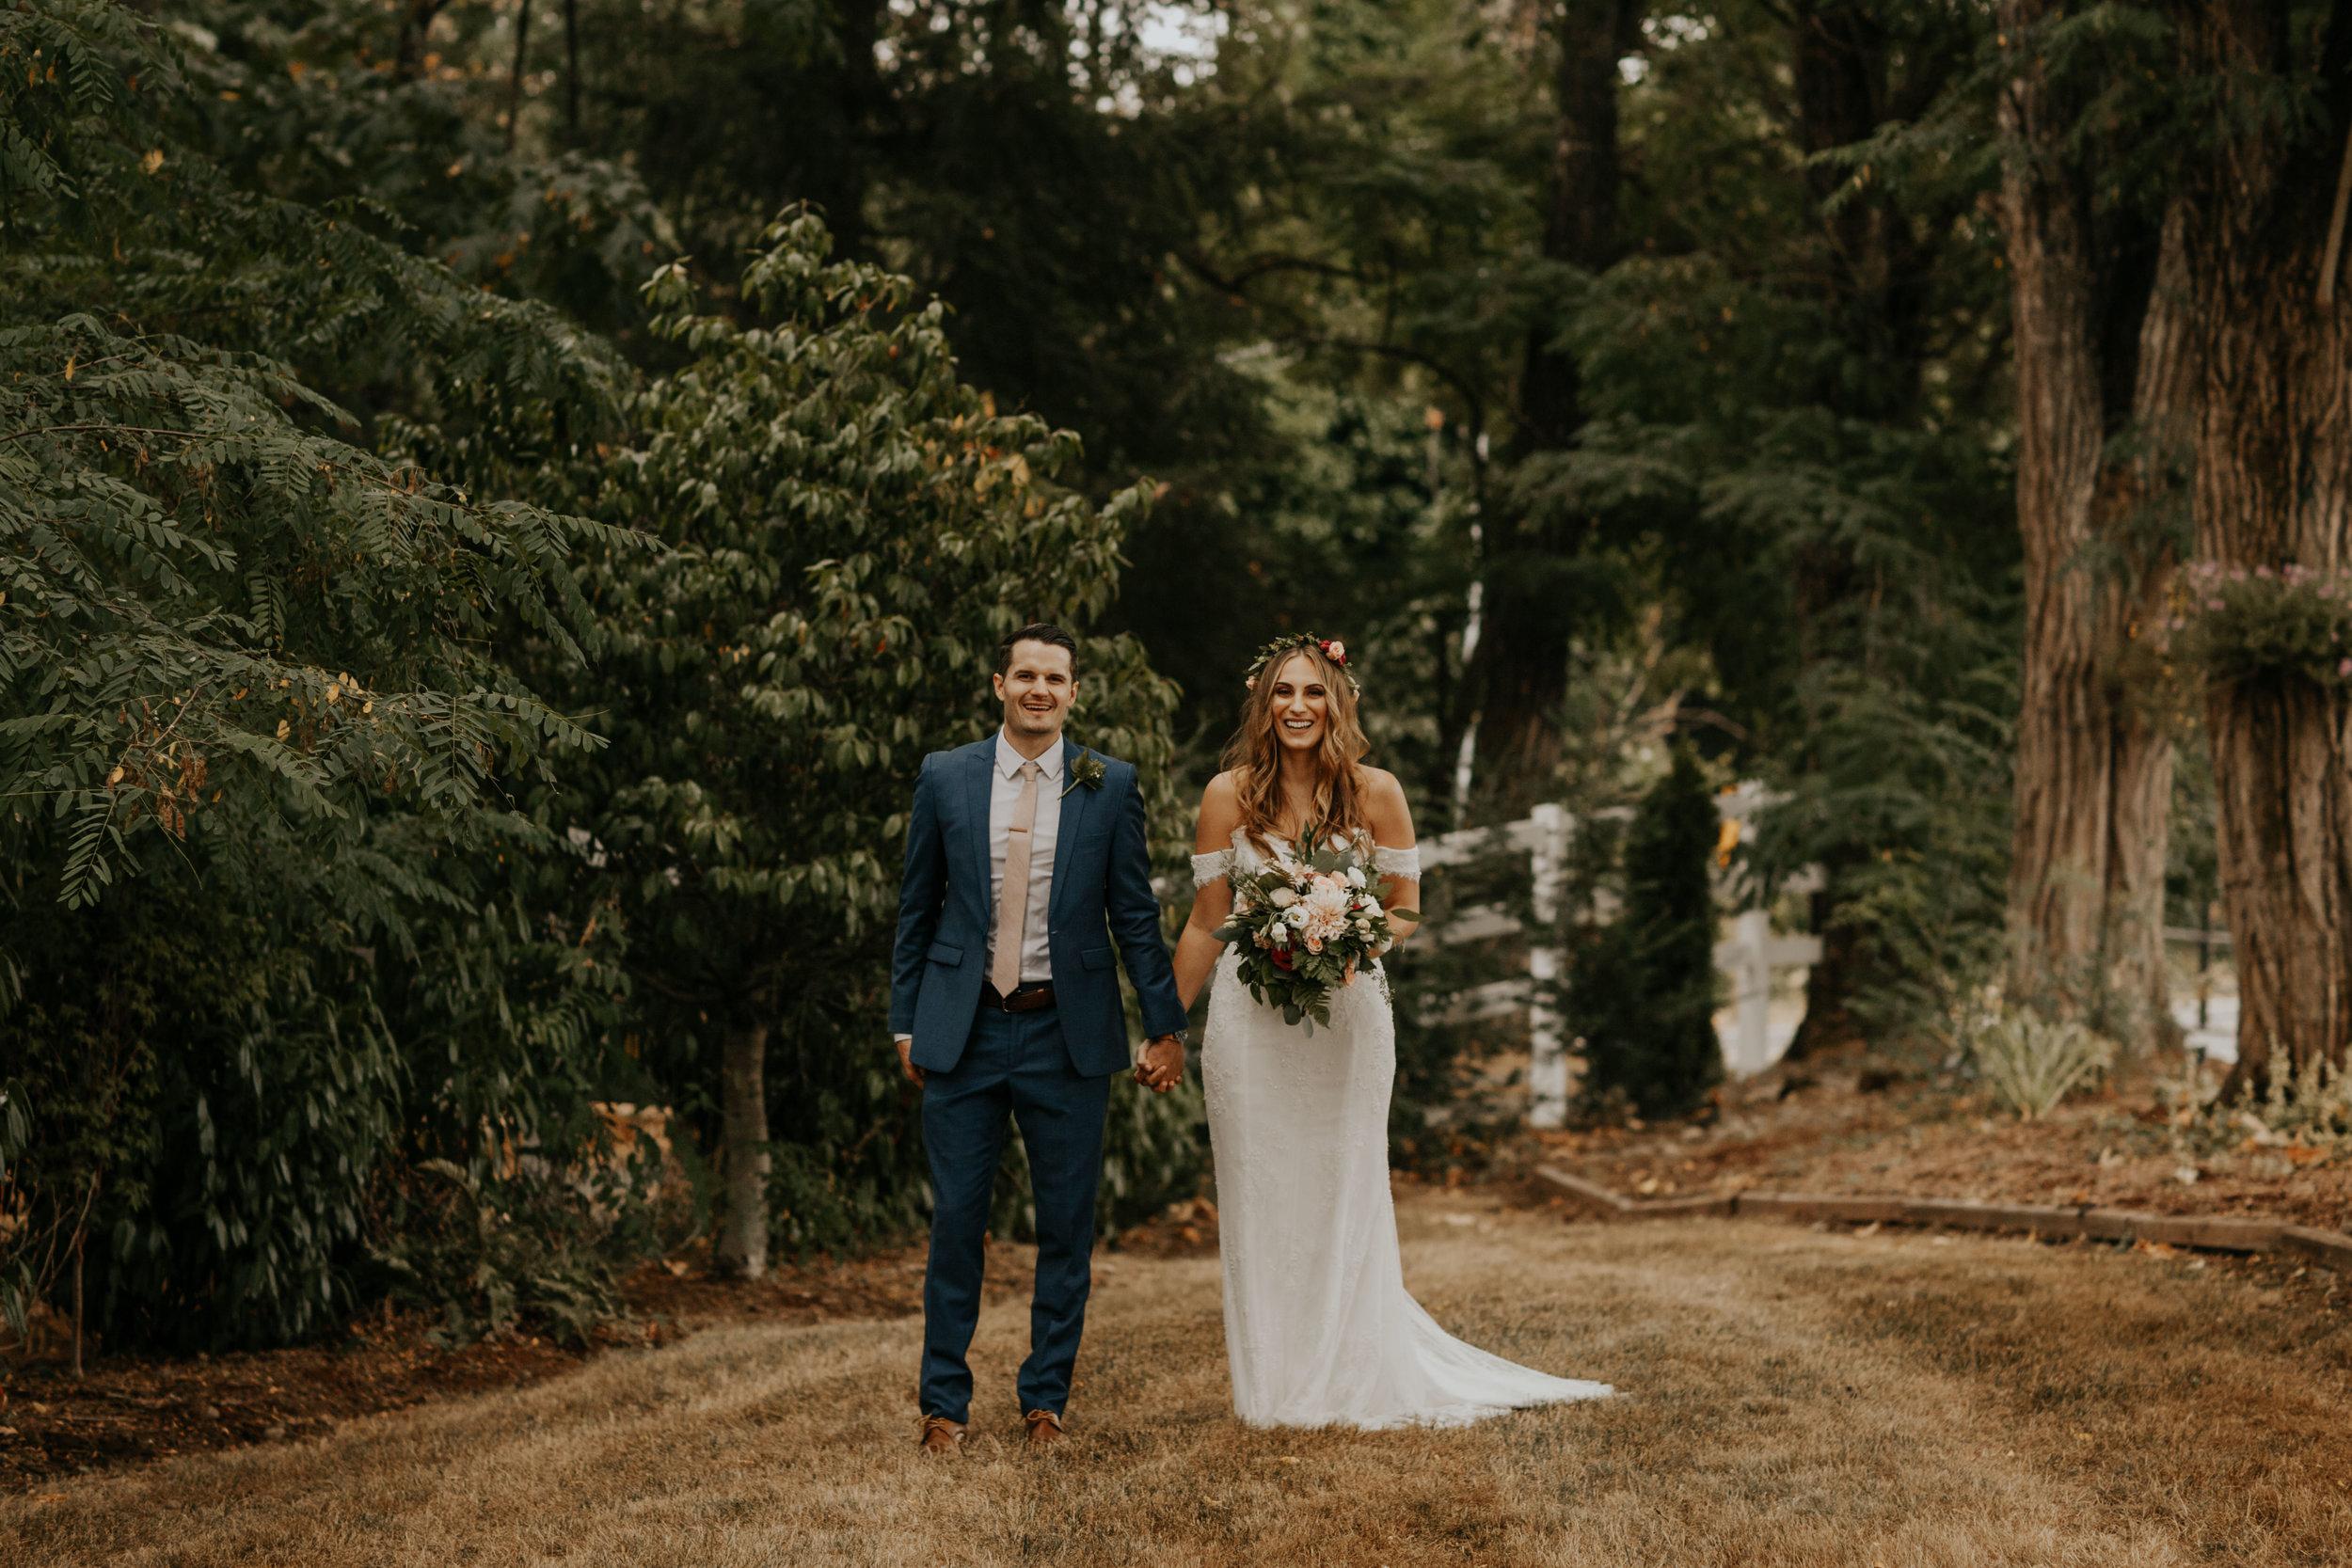 ginapaulson_jakitrevor_wedding-223.jpg